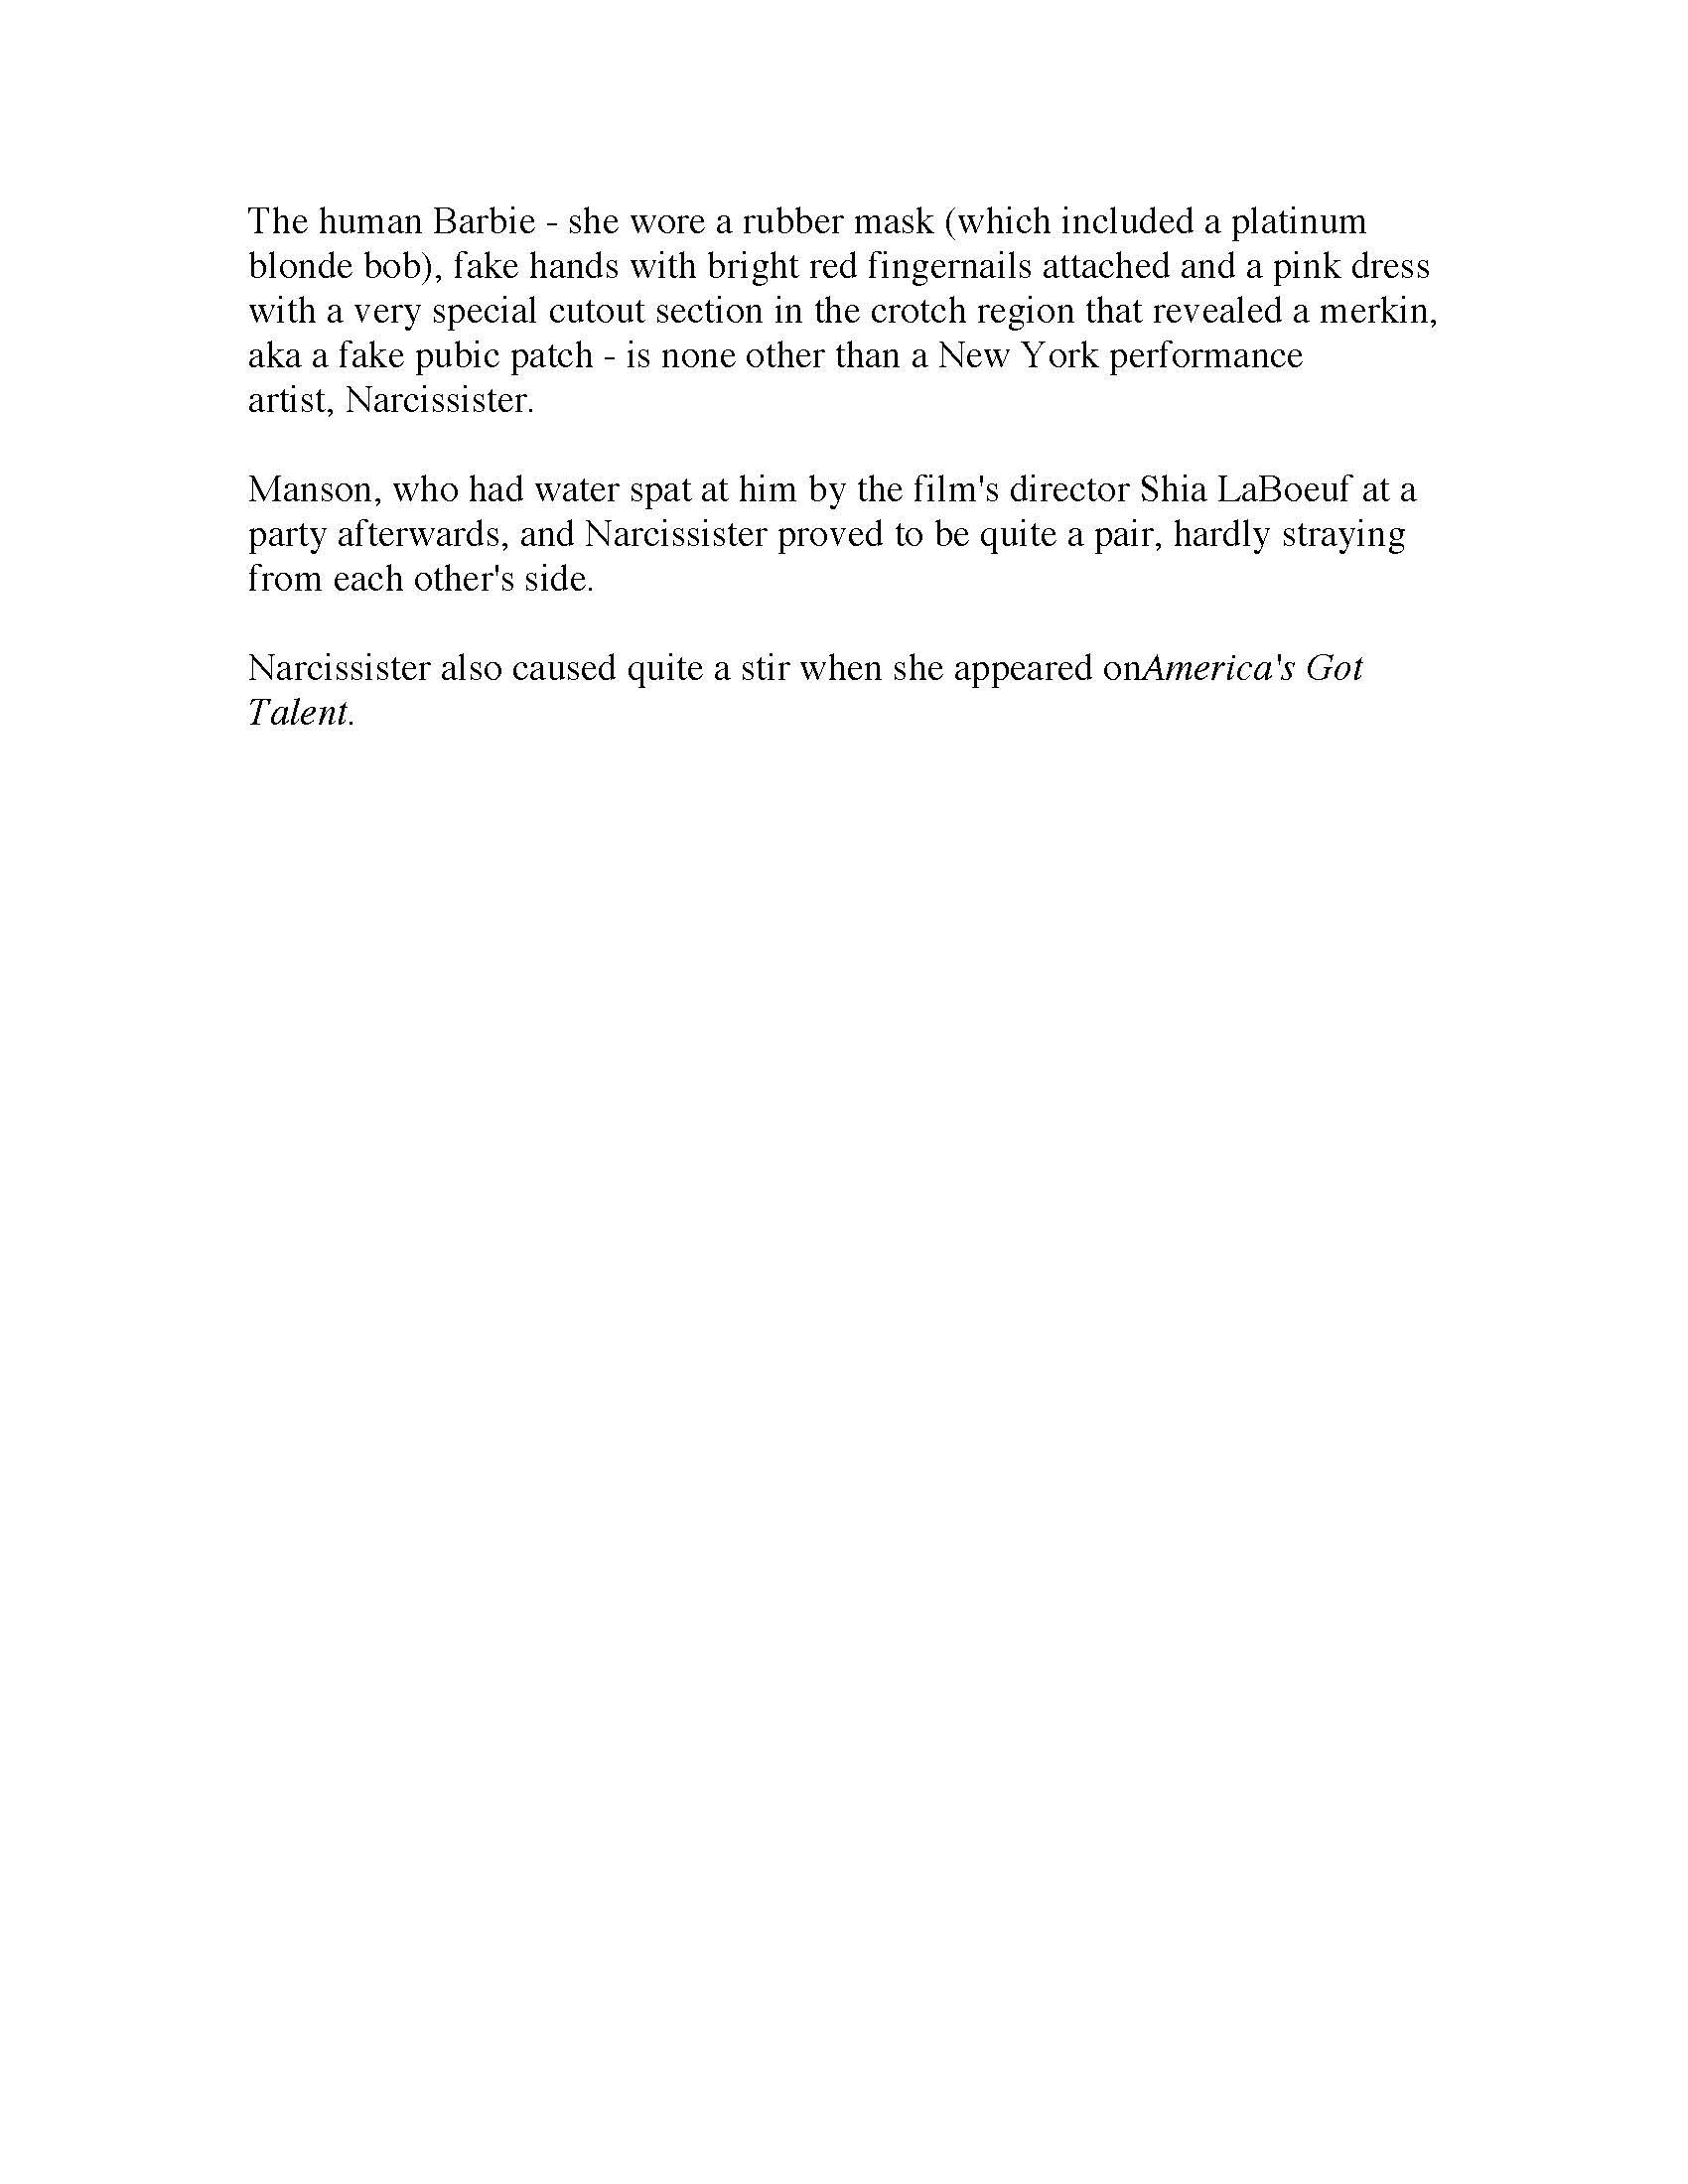 2011_DailyTelegraph_Page_2.jpg